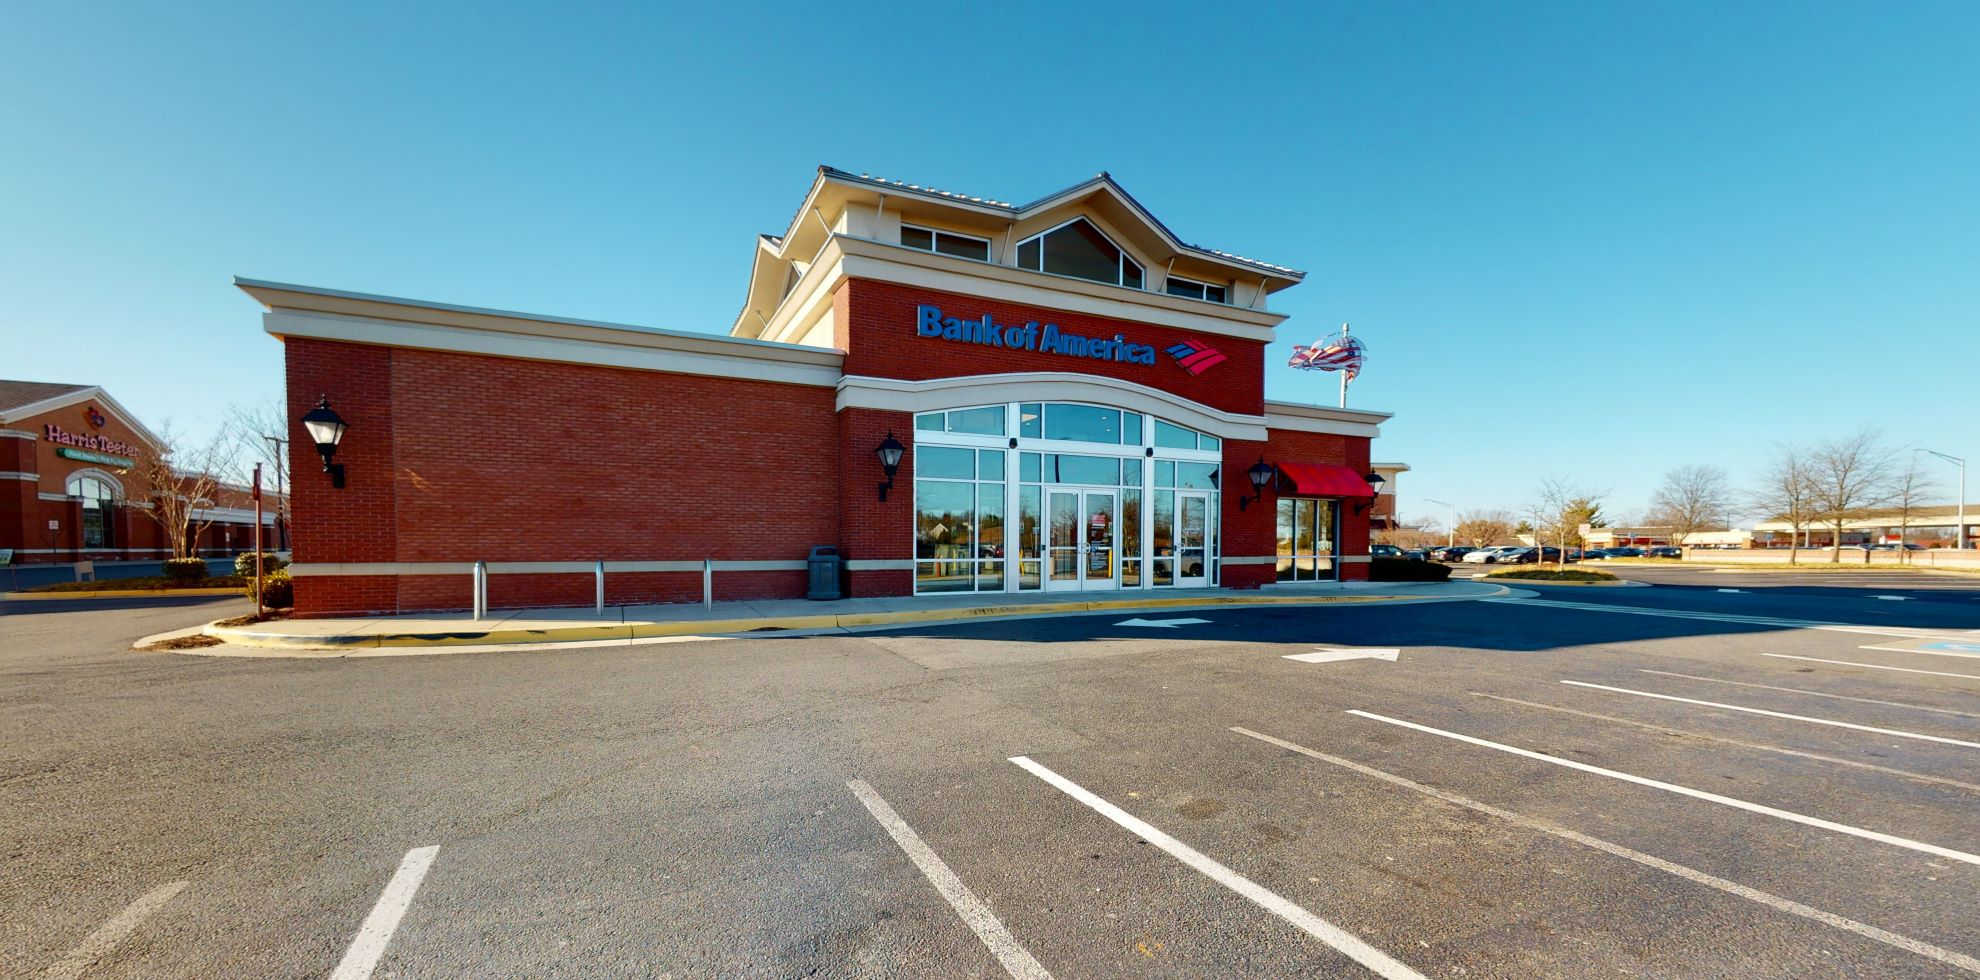 Bank of America financial center with drive-thru ATM | 10050 Market Cir, Manassas, VA 20110